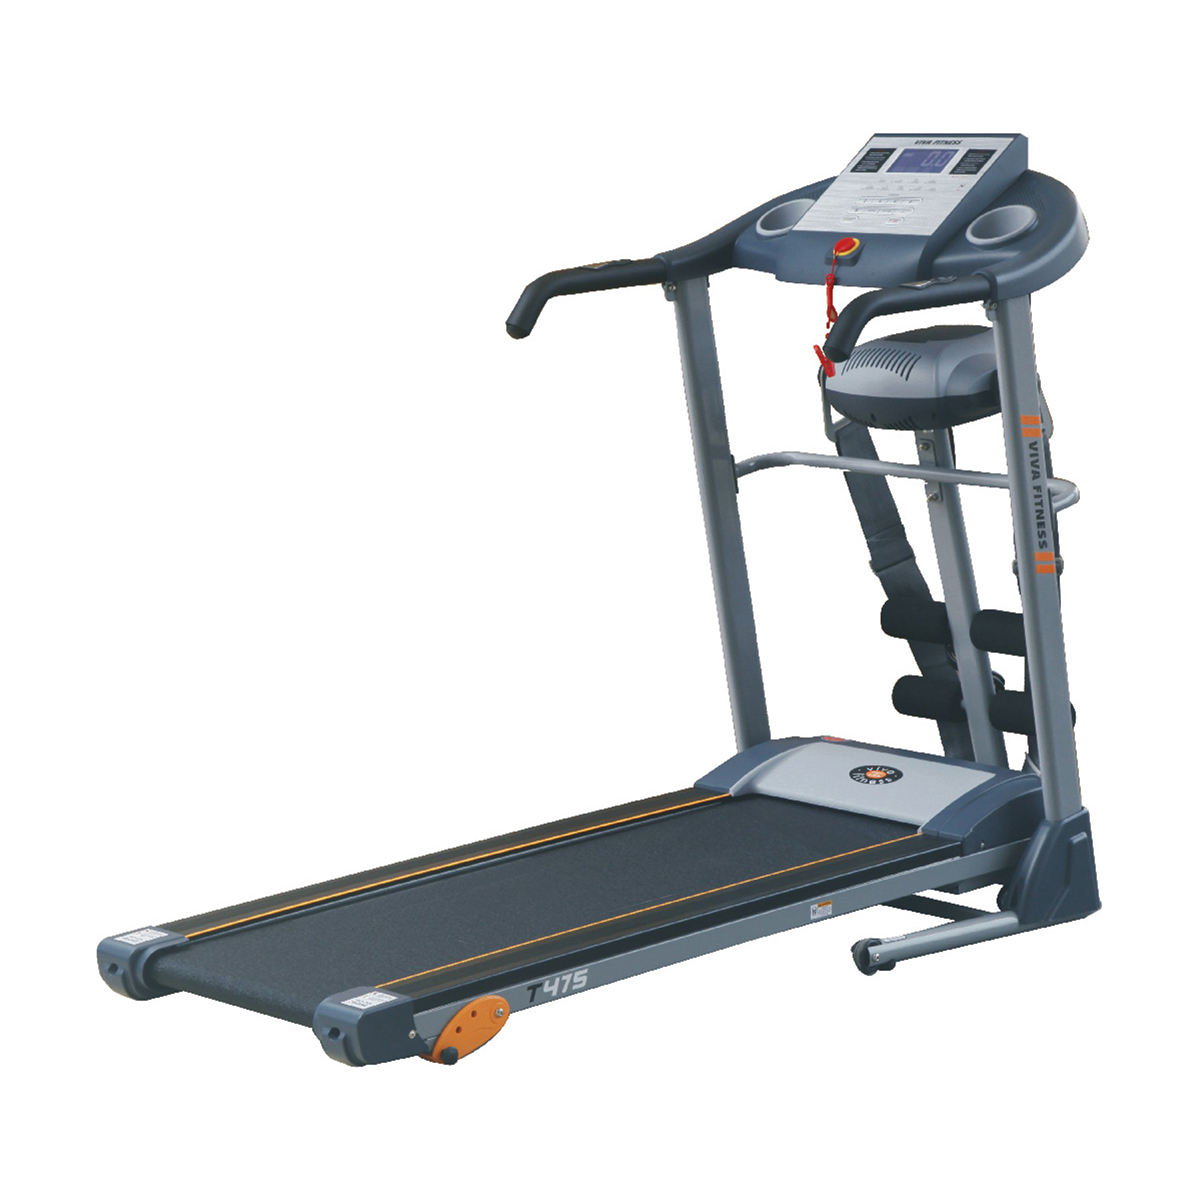 T-475 Motorized Treadmill